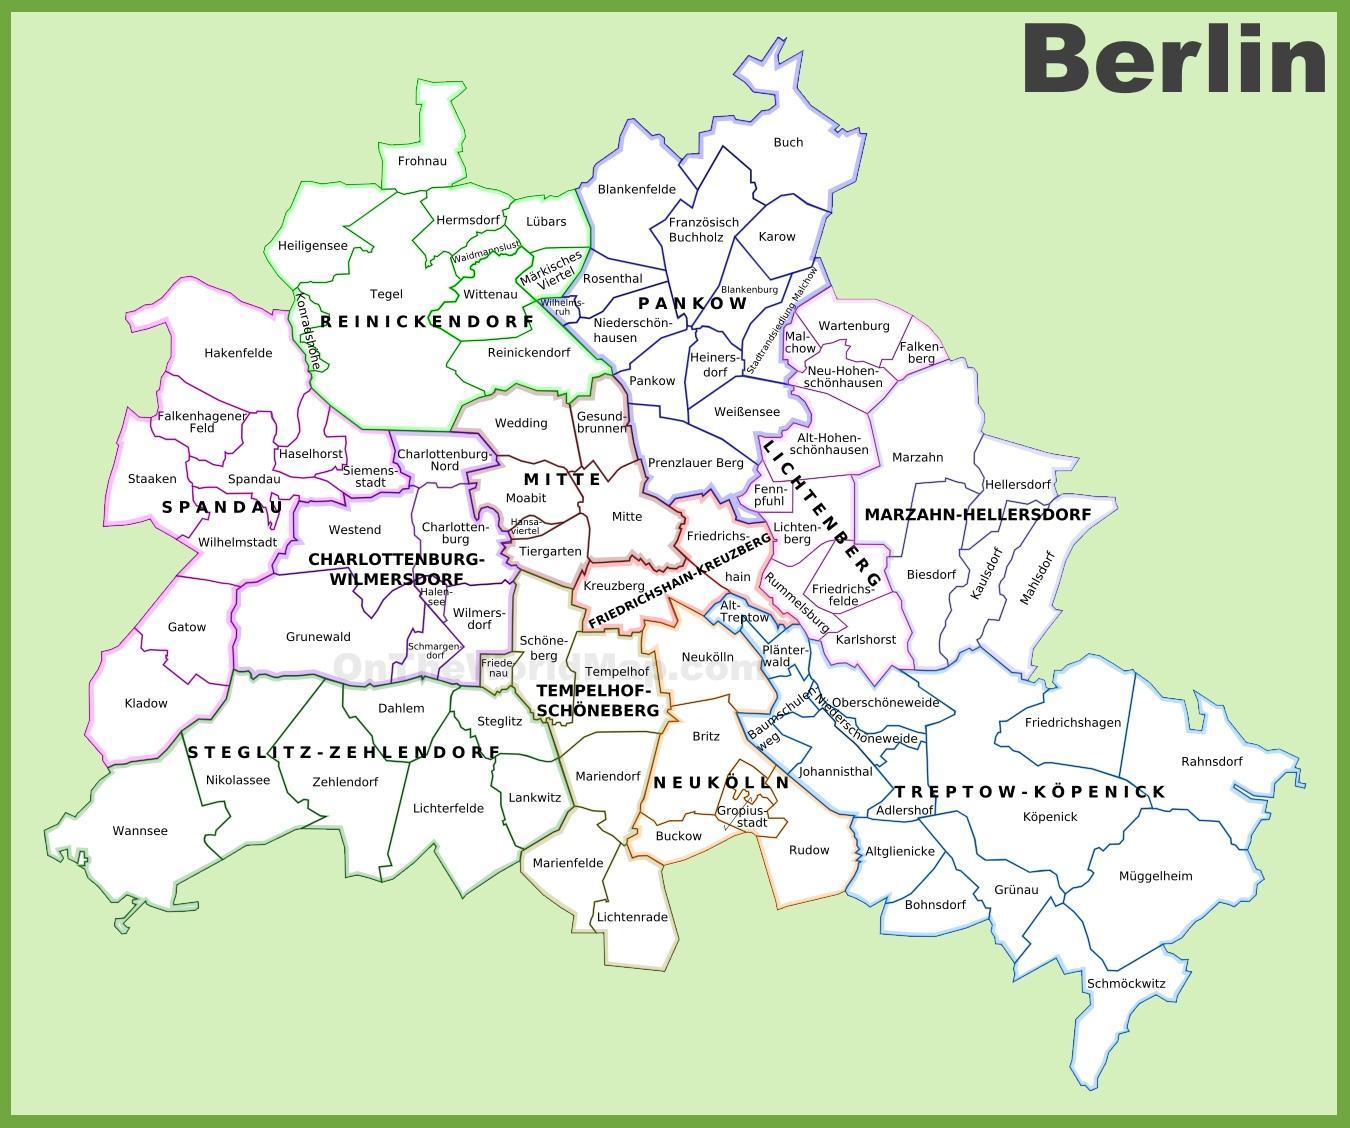 Berlin Mitte Karte.Bezirk Mitte Berlin Karte Berlin Shopping Distrikte Karte